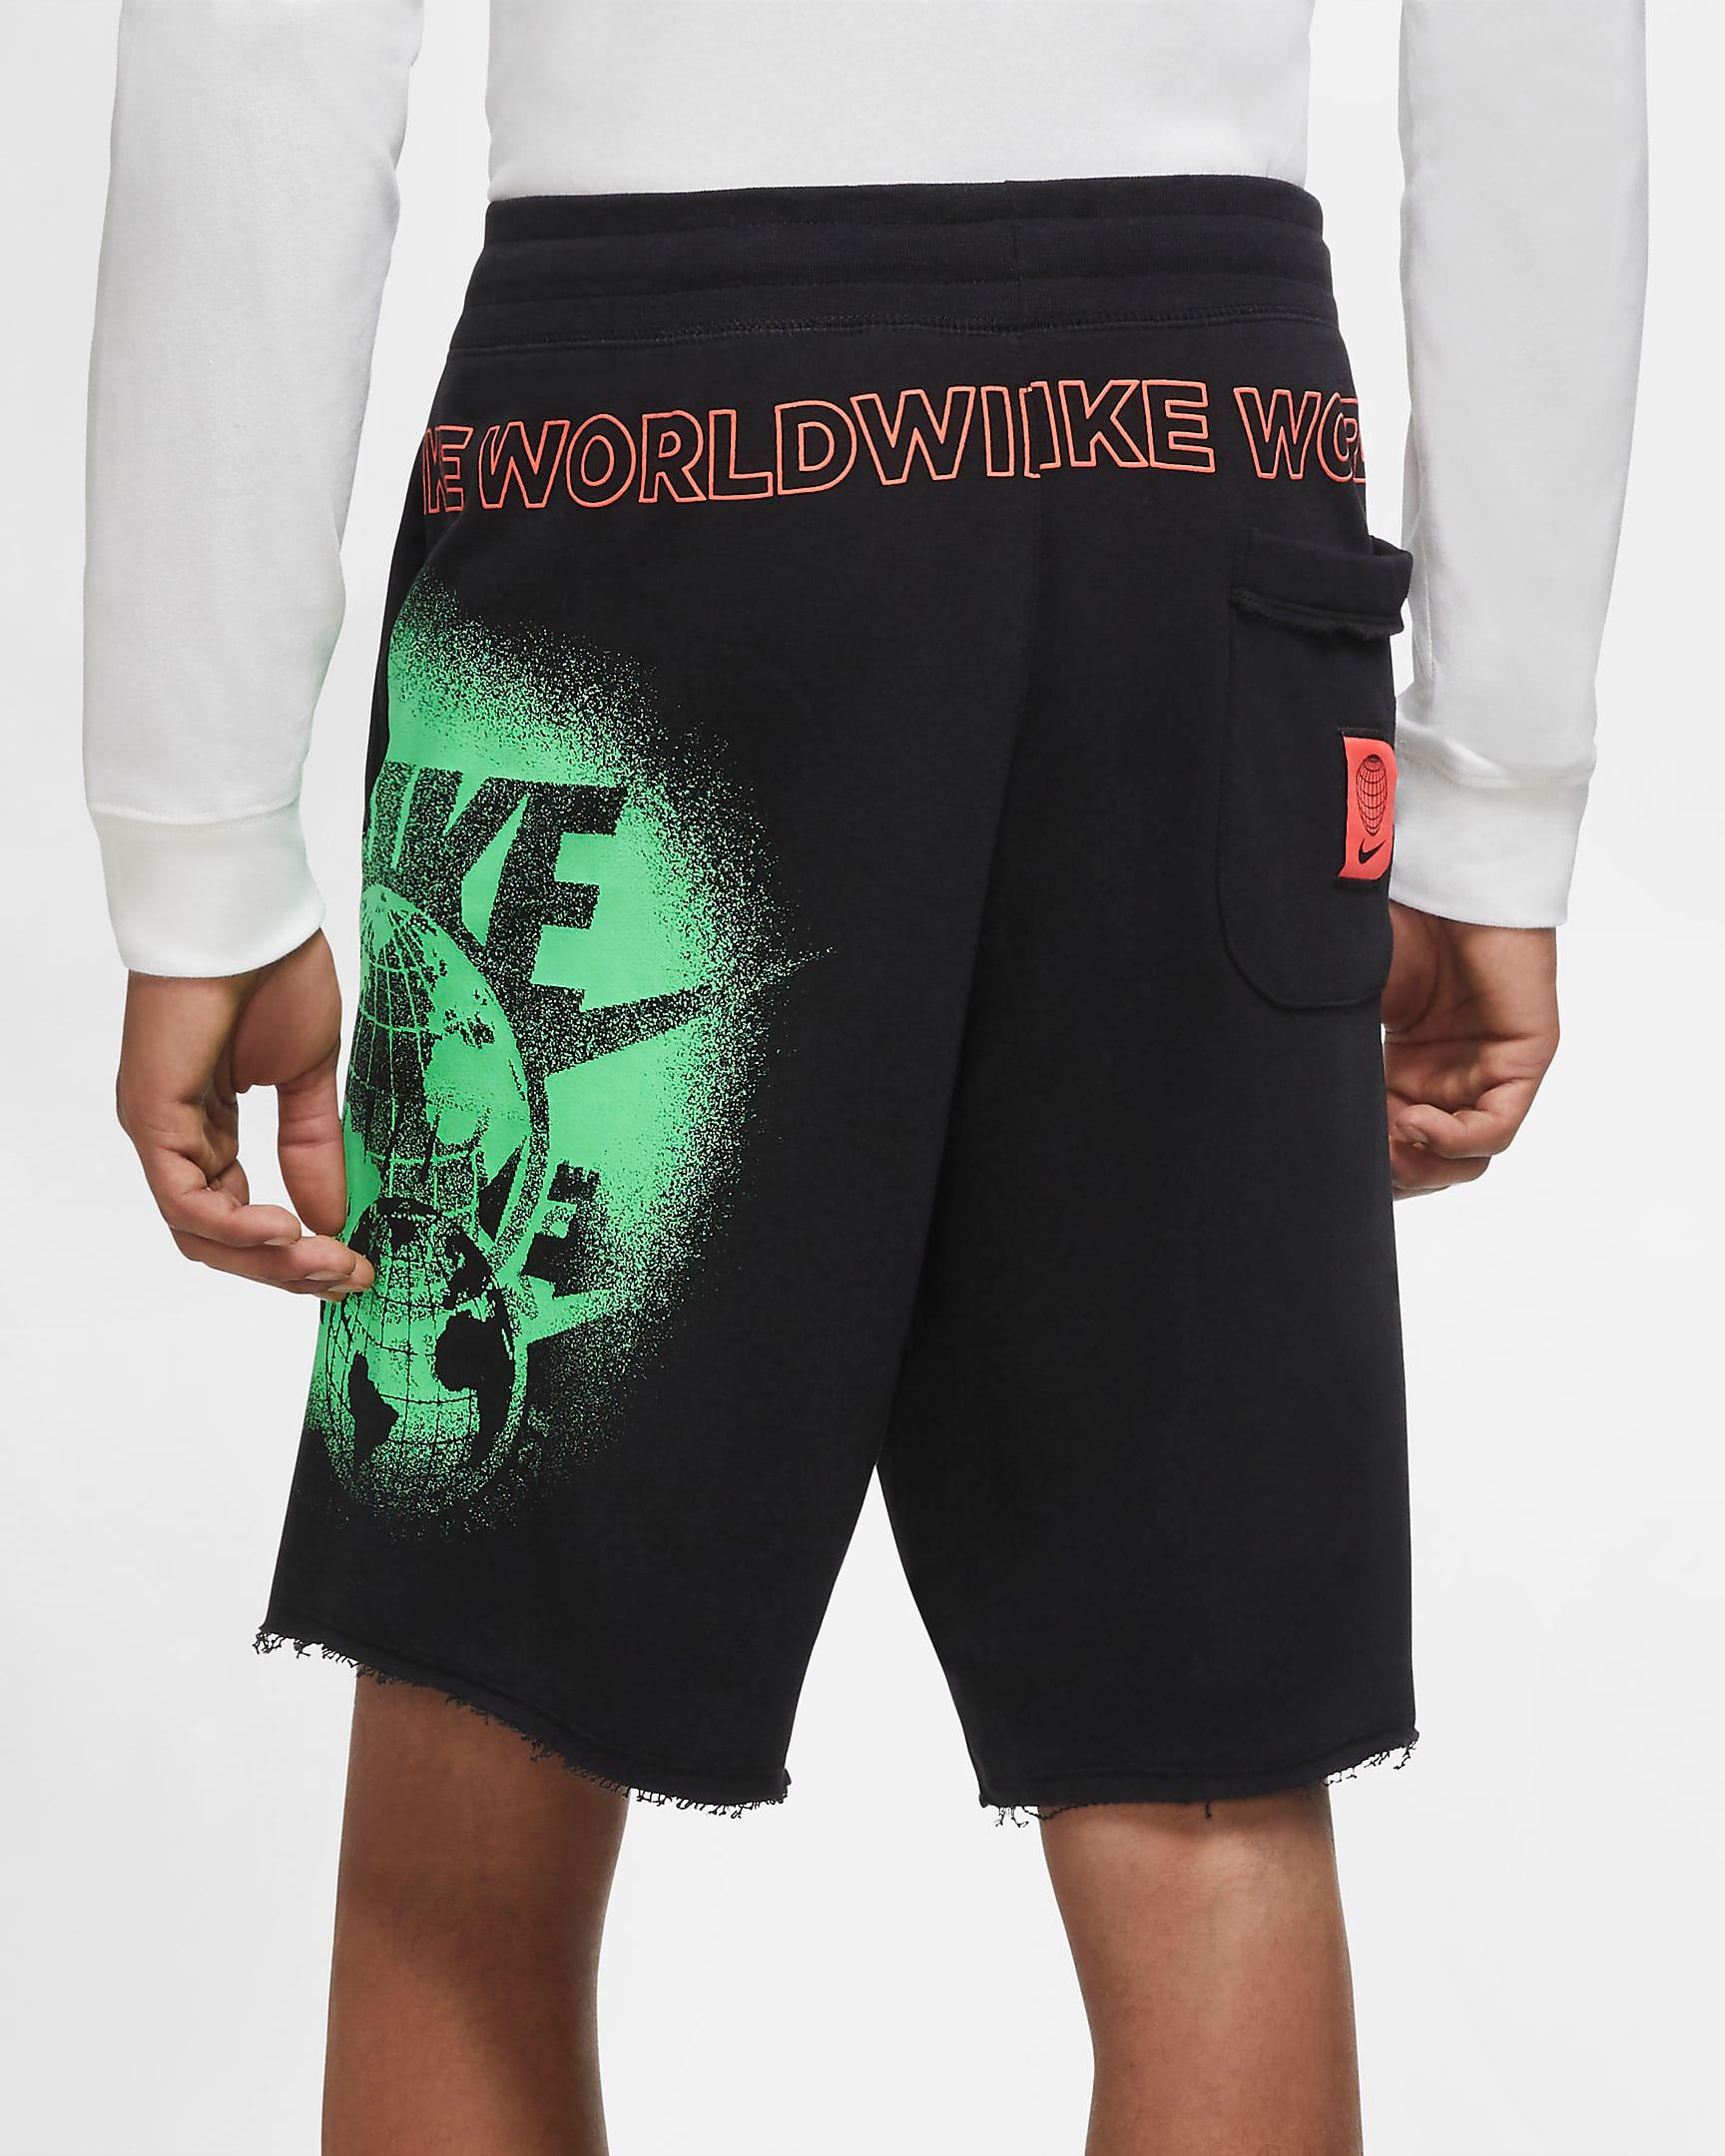 nike-sportswear-worldwide-alumni-shorts-black-green-2